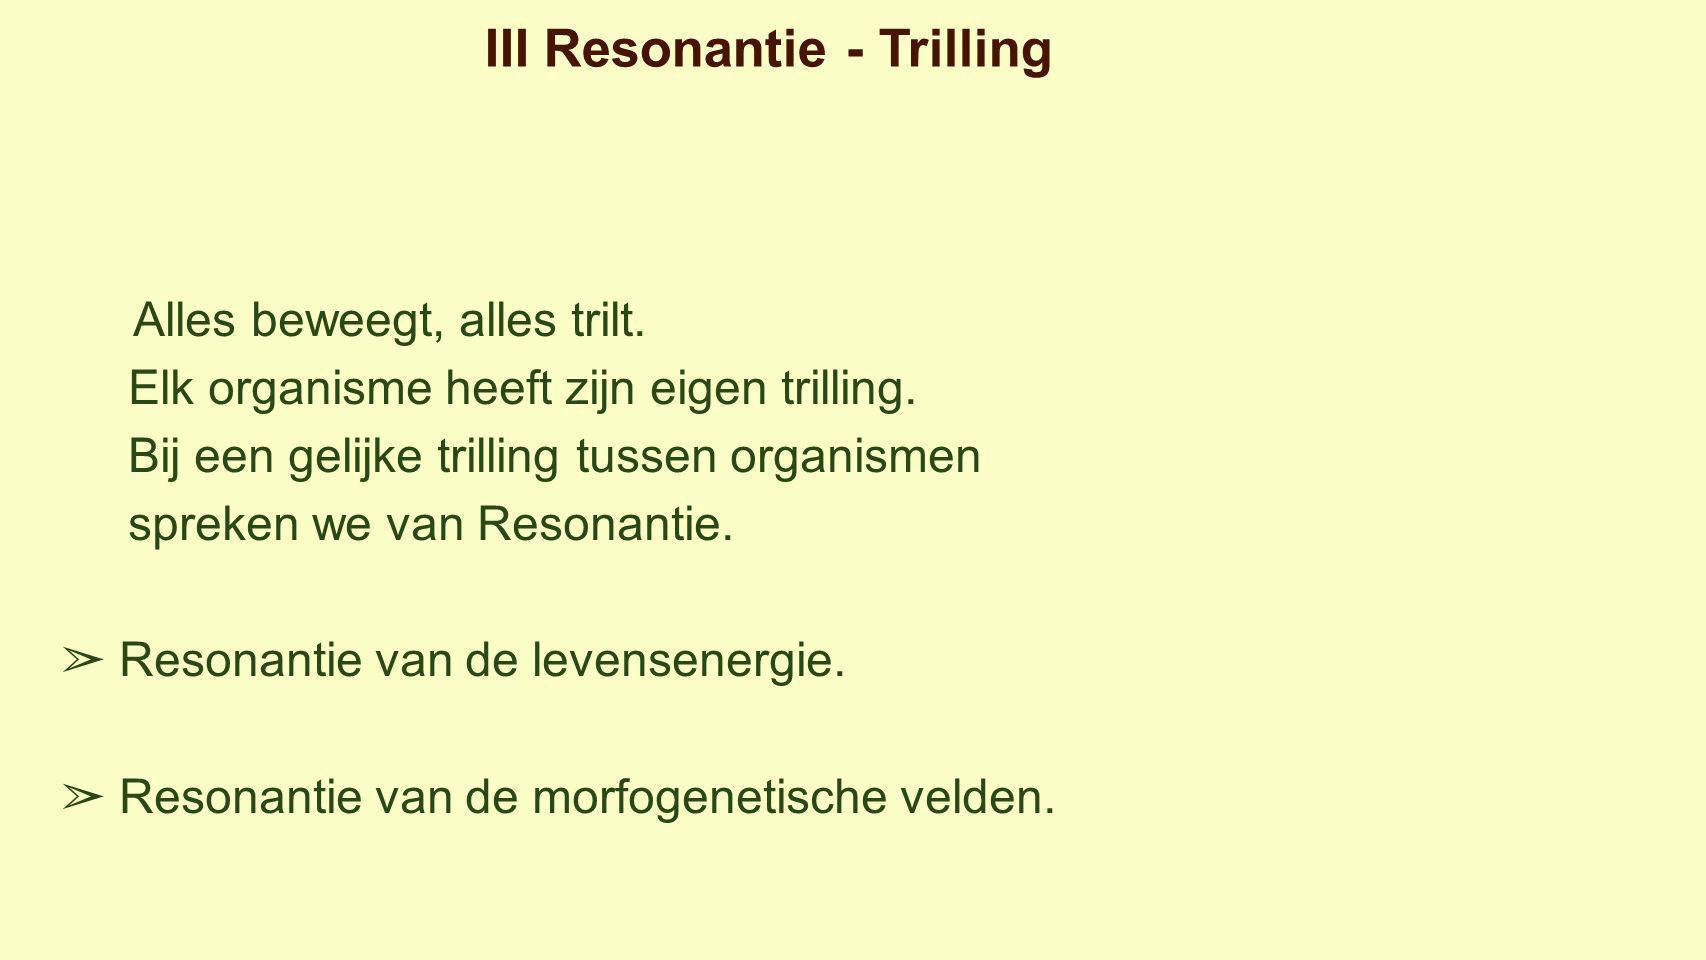 III Resonantie - Trilling Alles beweegt, alles trilt.